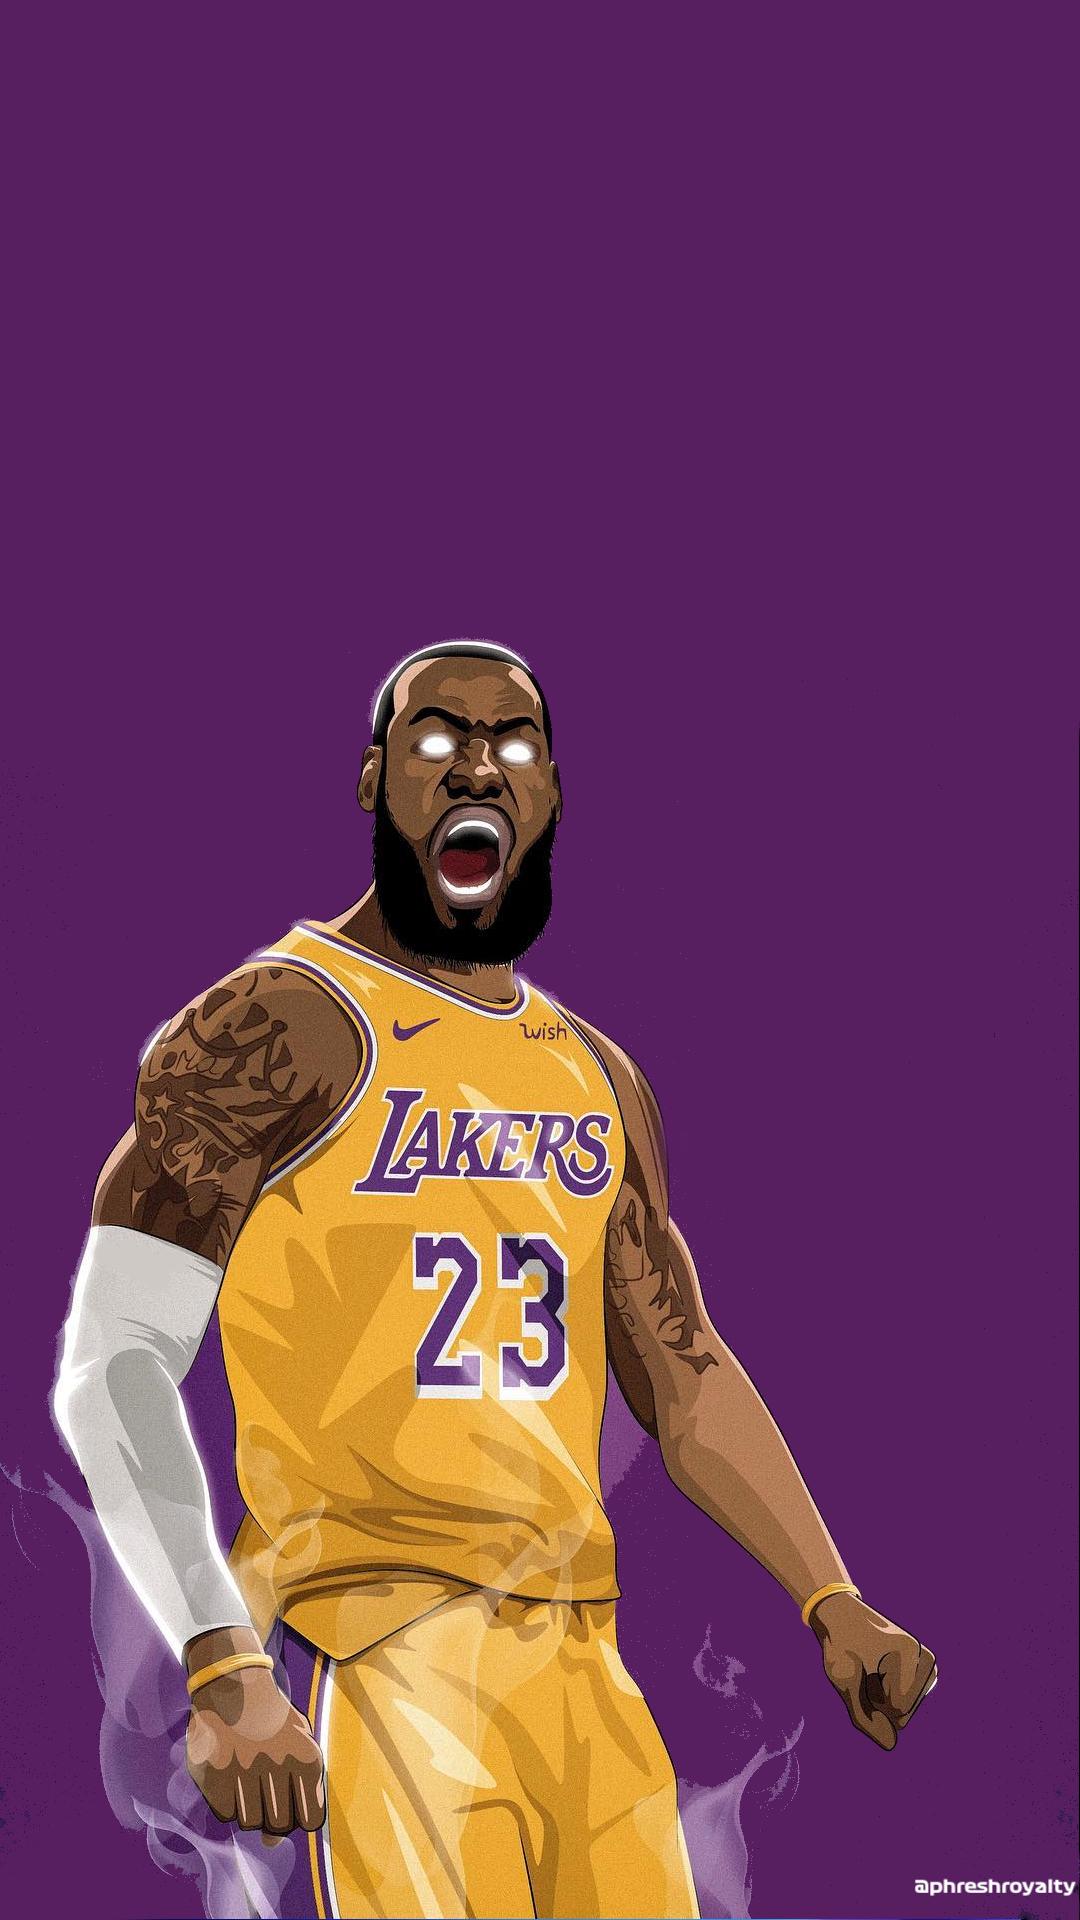 Lebron james wallpaper hd: Iphone Lebron James Animated ...